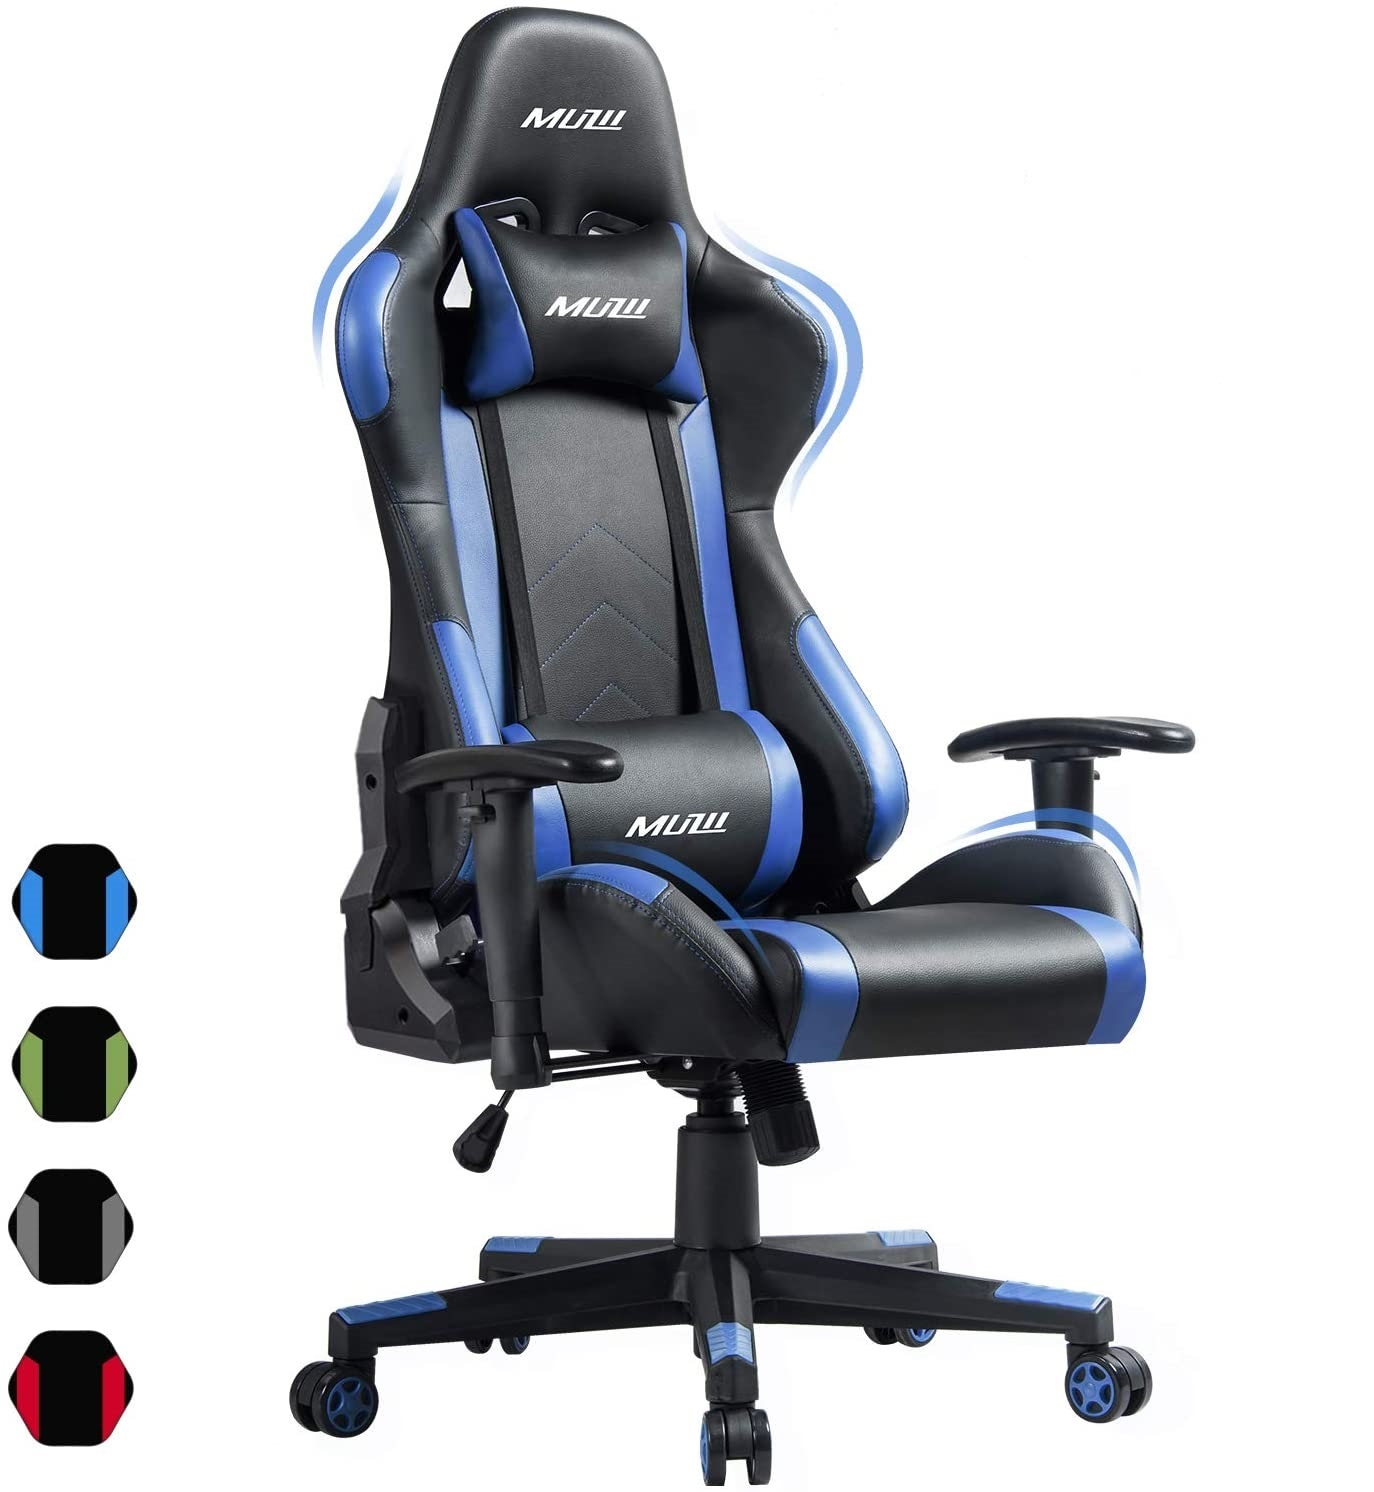 Muzii BIFMA Certified Gaming Chair